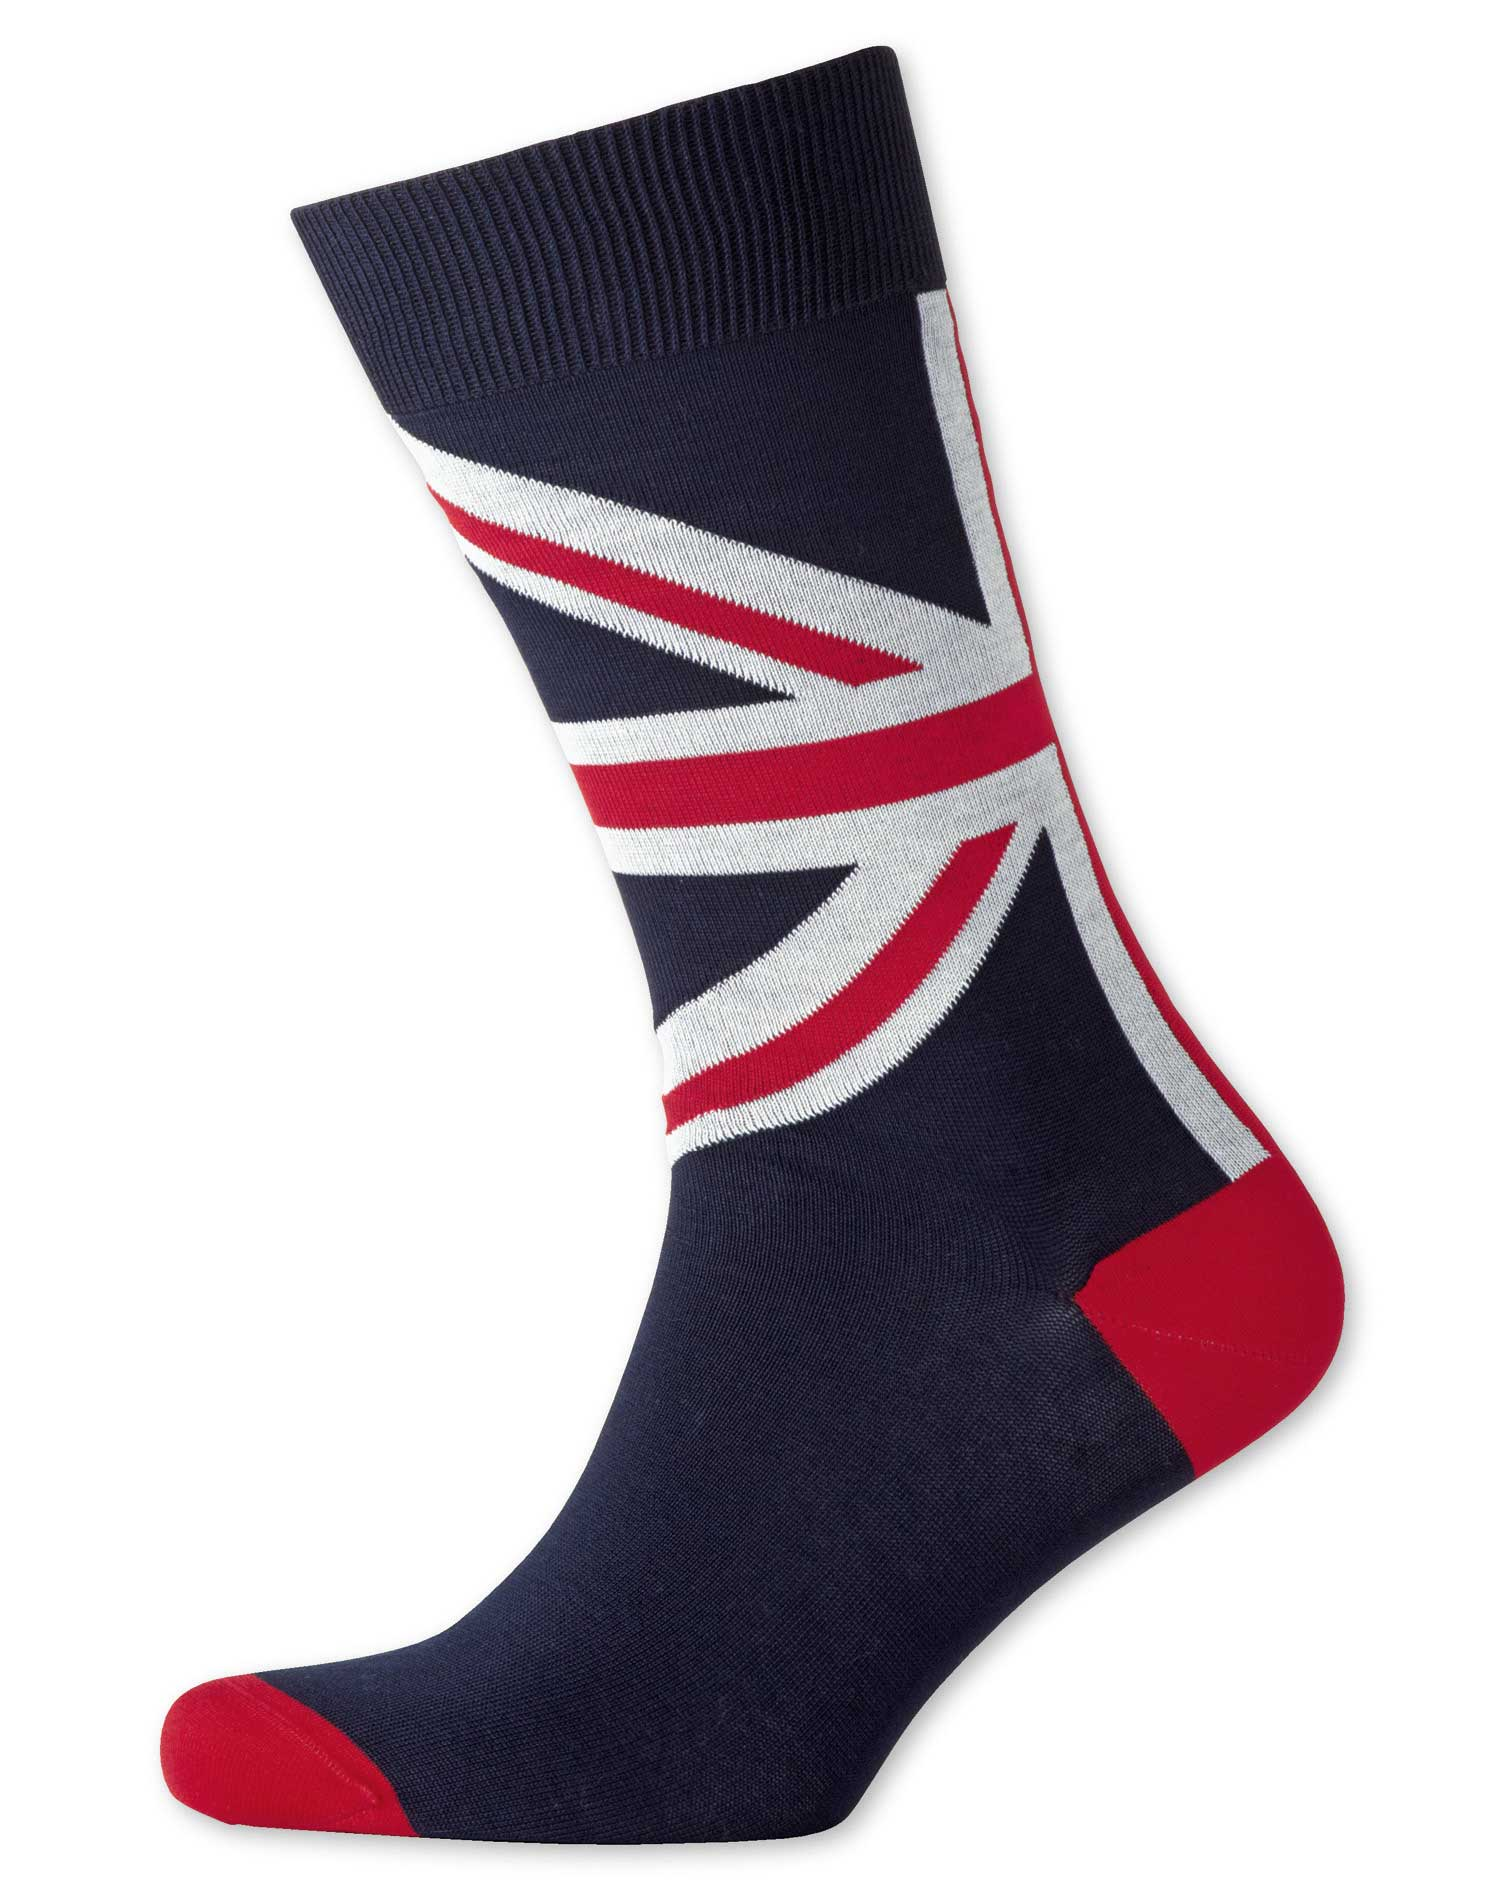 Union Jack Socks Size Large by Charles Tyrwhitt